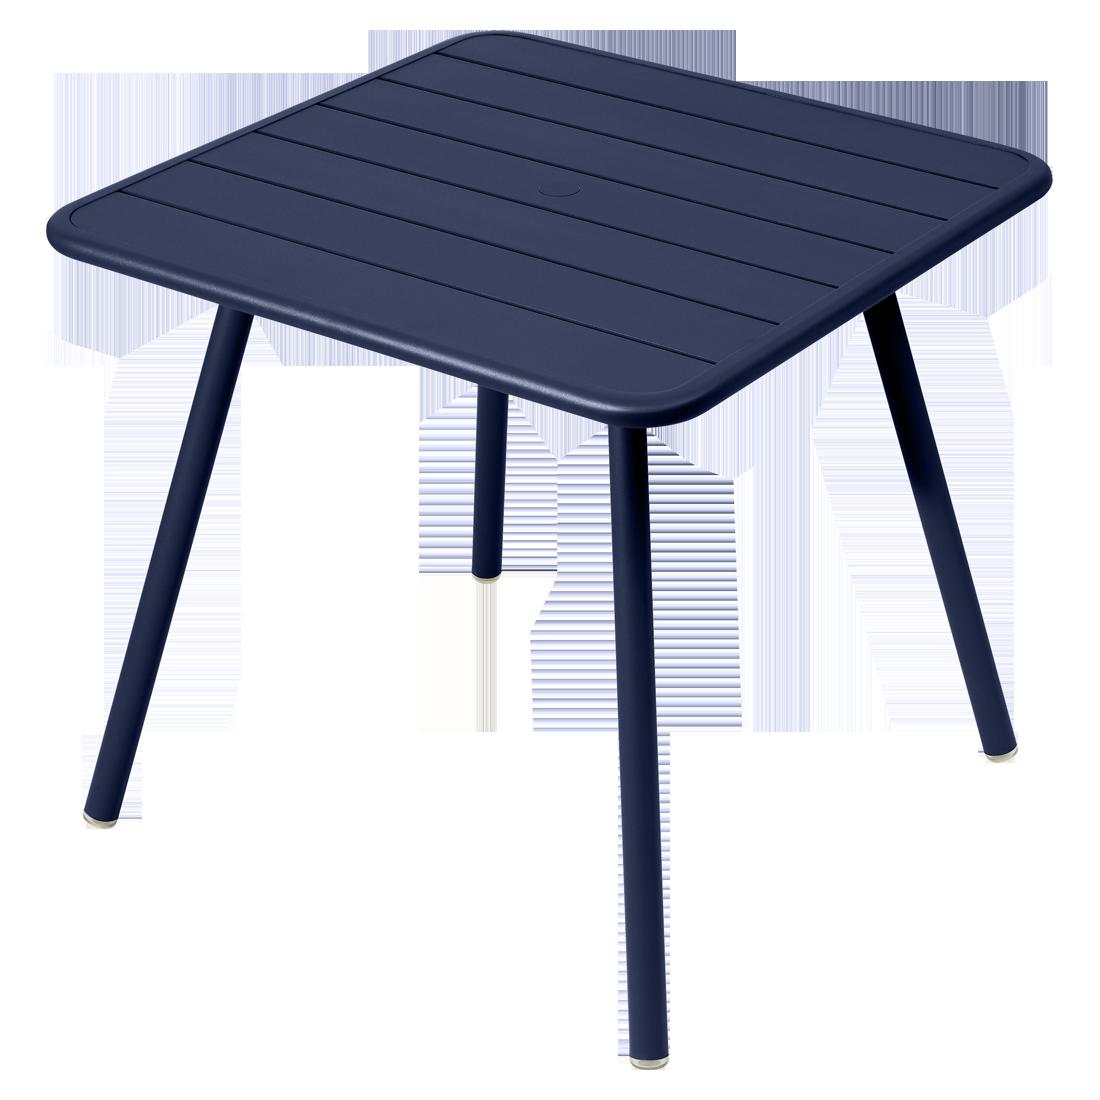 table de jardin, table metal, table 4 places, table bleu, table fermob